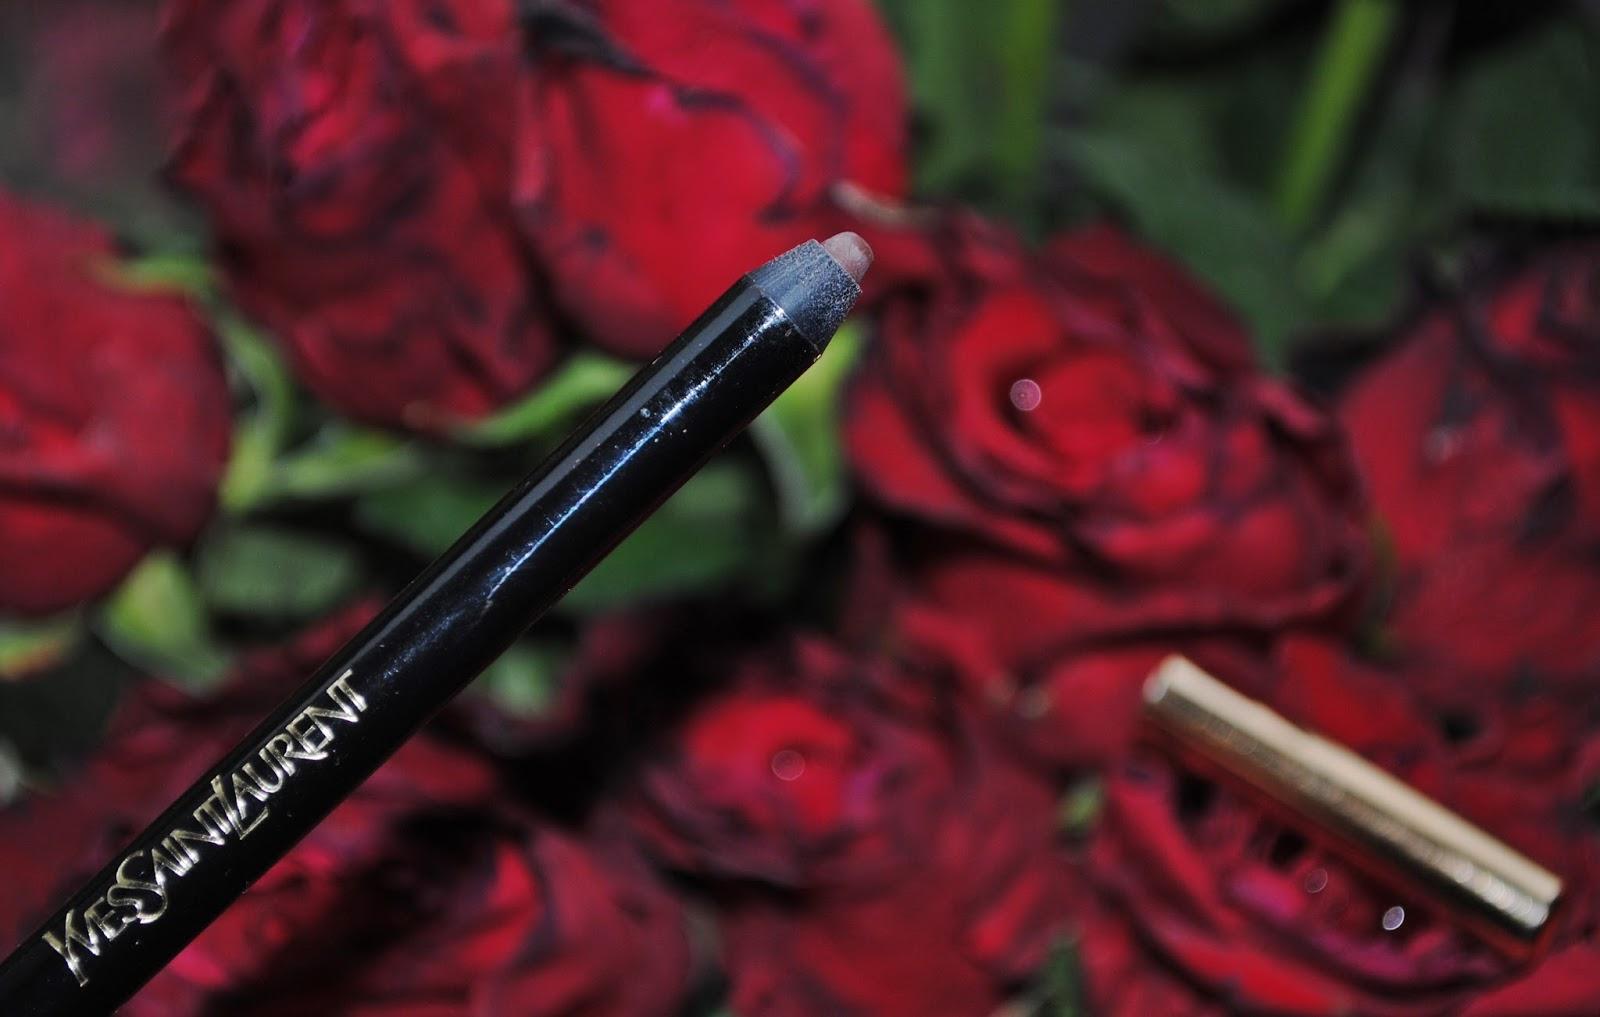 Kredka YSL Dessin du Regard, Patent Leather beautypediapatt.blogspot.com